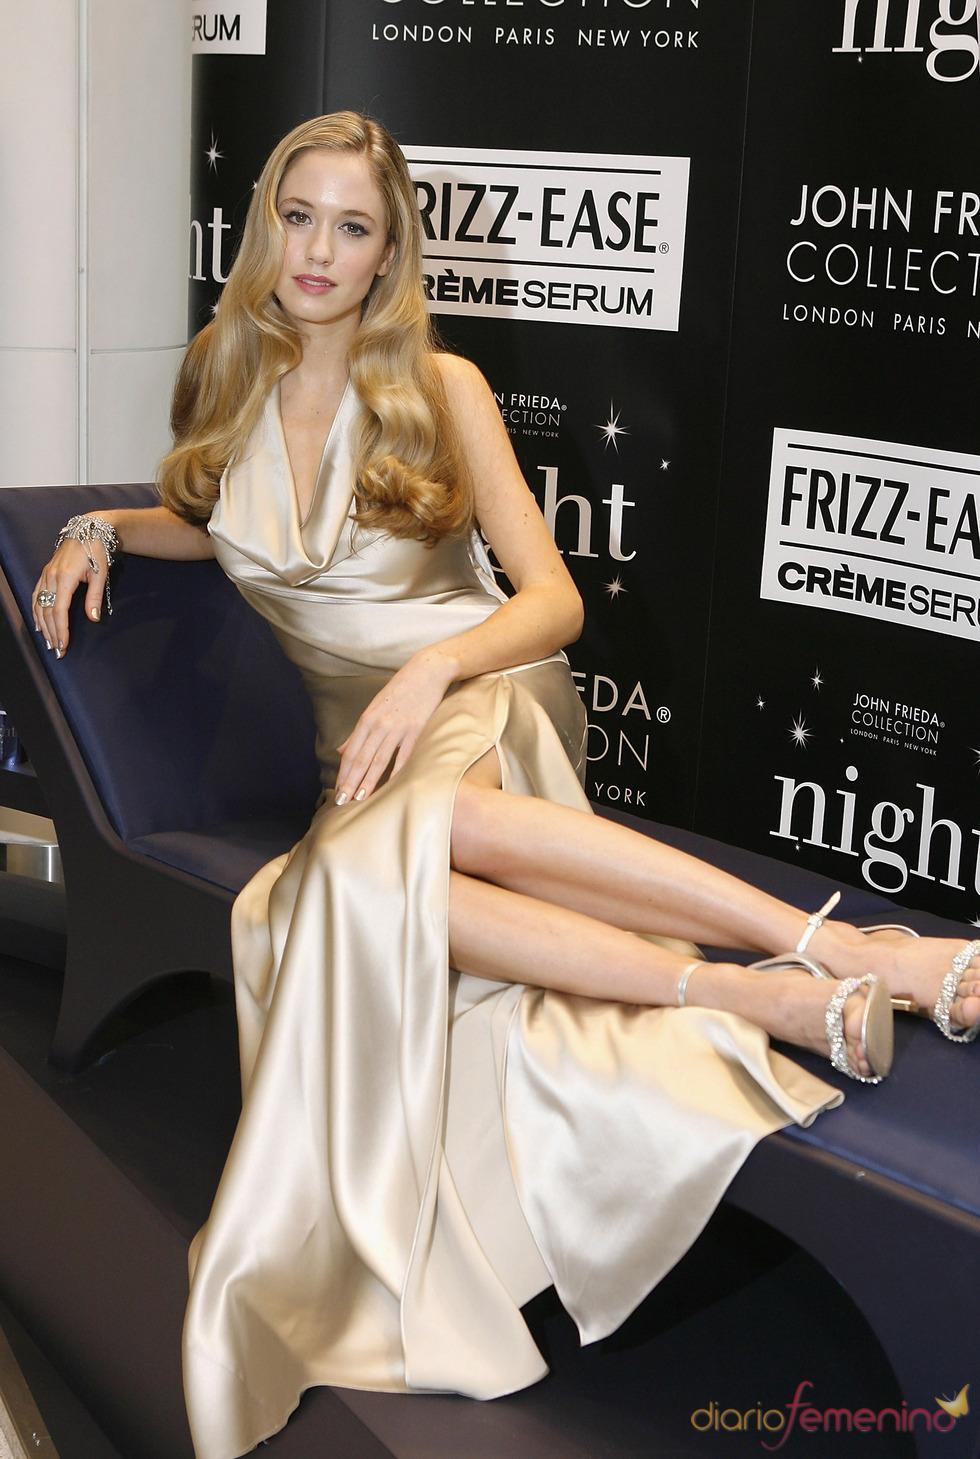 La modelo Florence Brudenell-Bruce